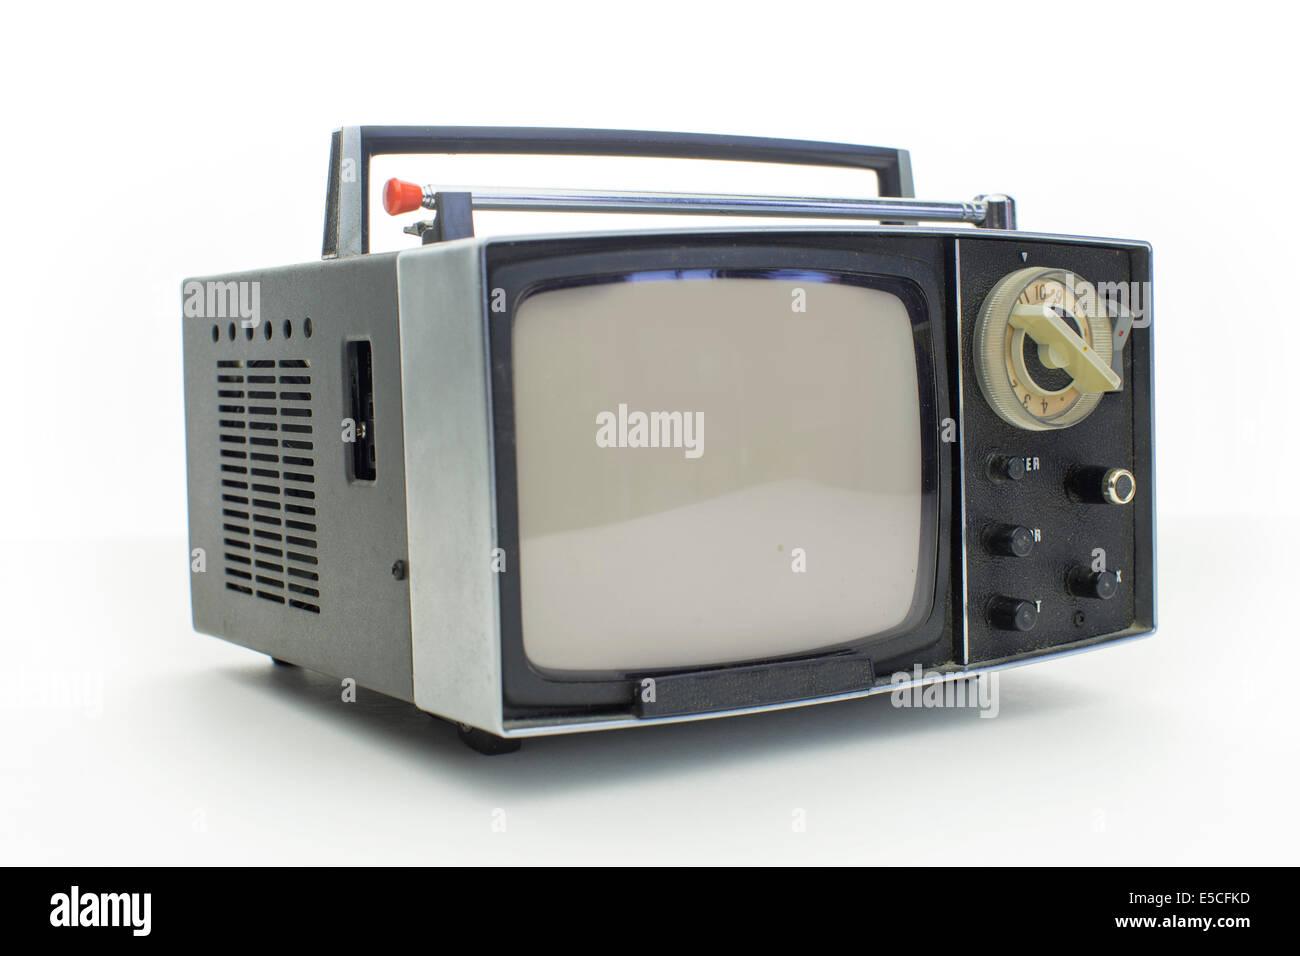 really cool retro vintage portable televison shot against white - Stock Image